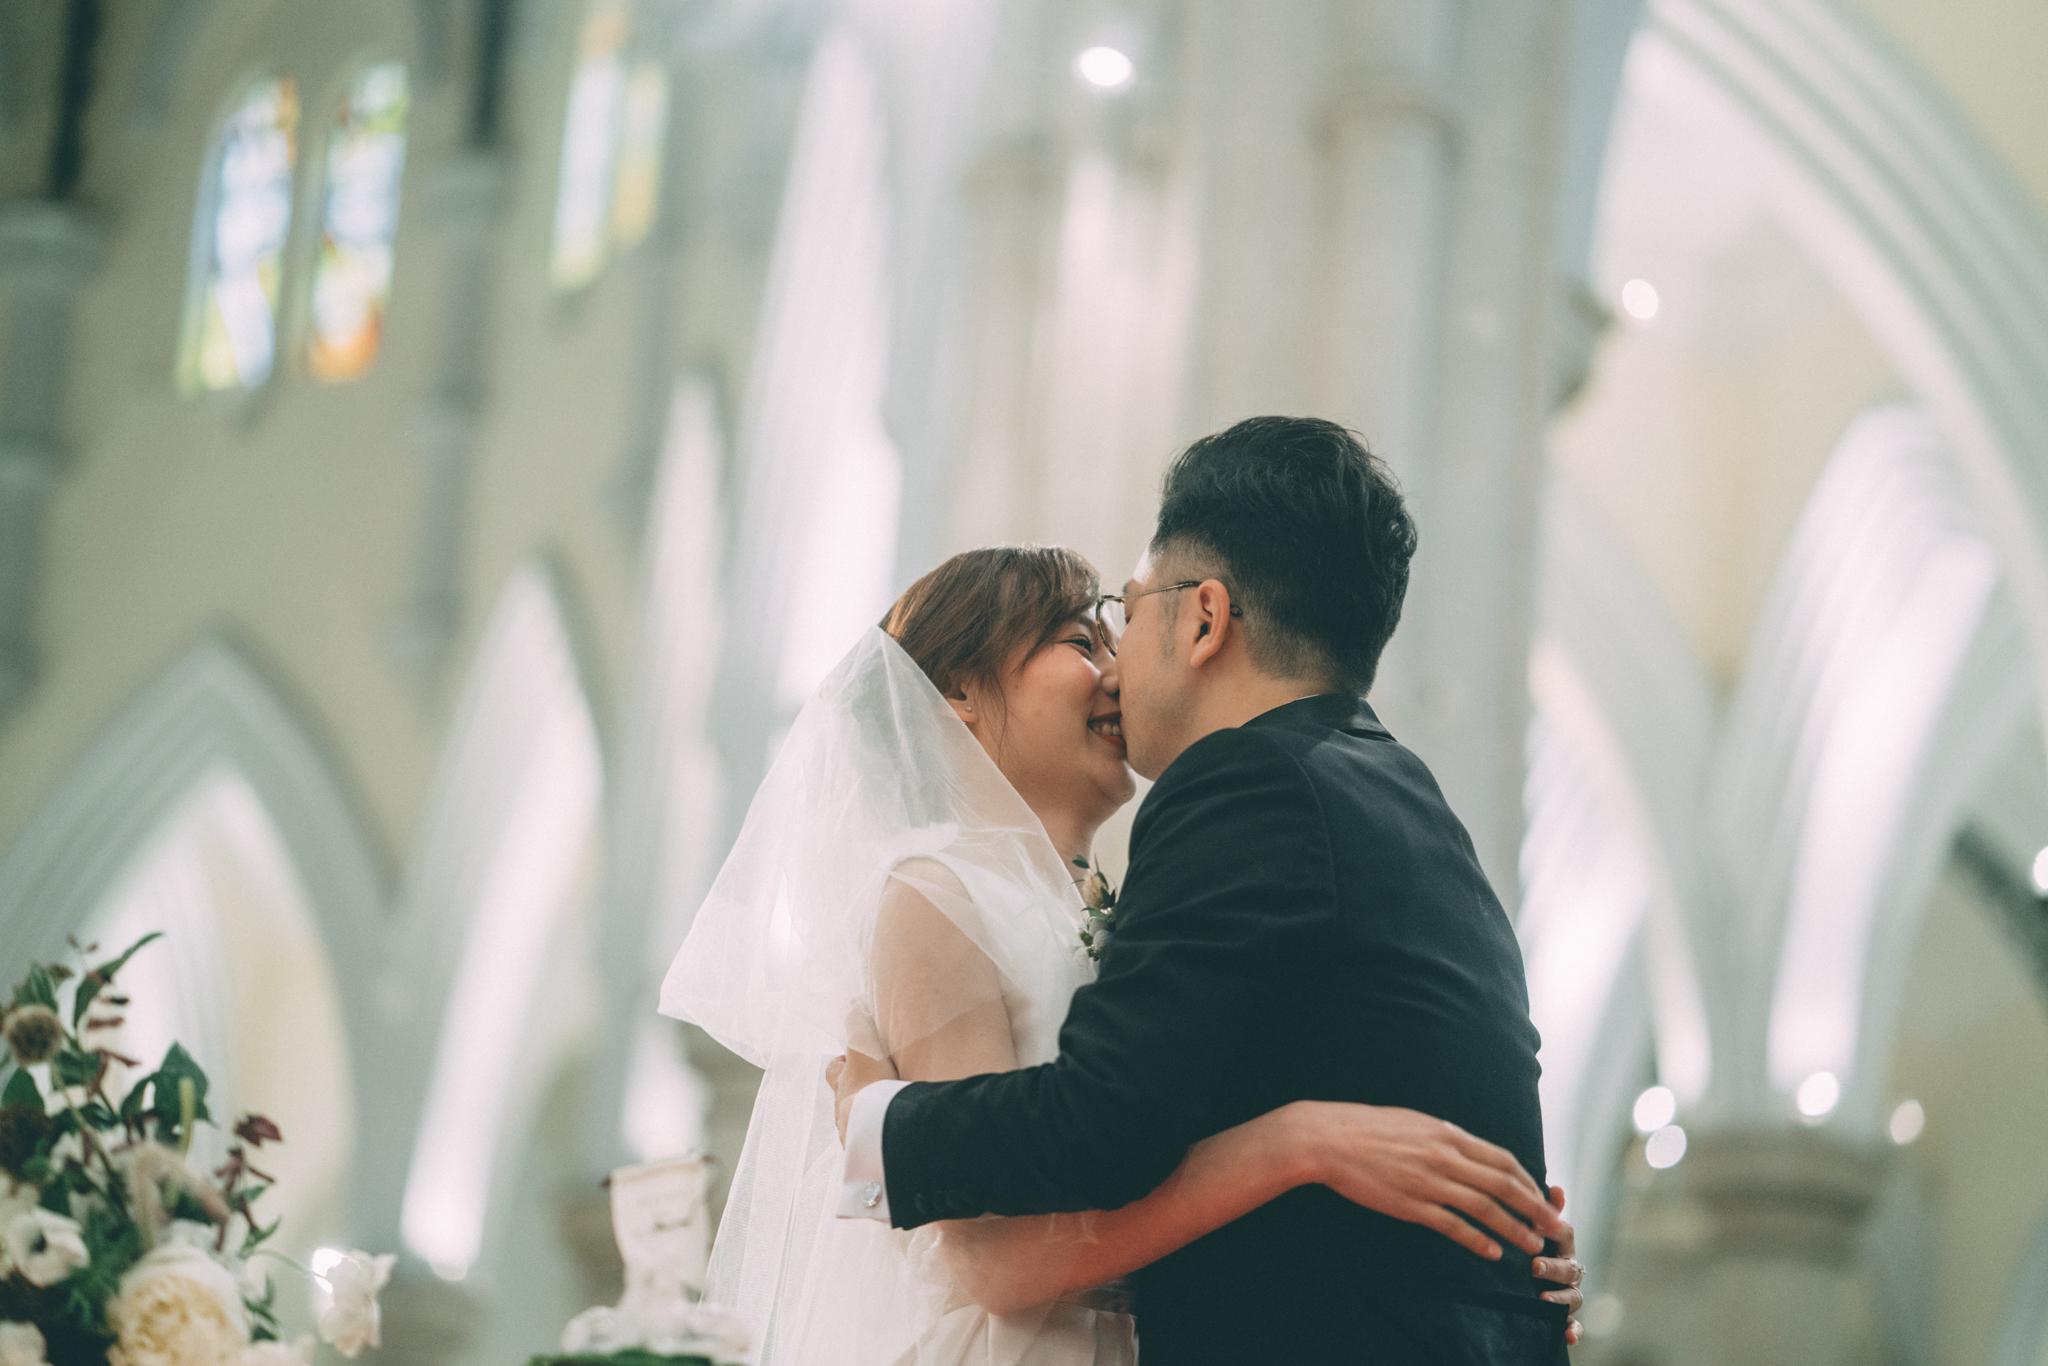 [ WEDDING DAY PHOTOSHOOTING & VIDEO ] @mushroom.visuals